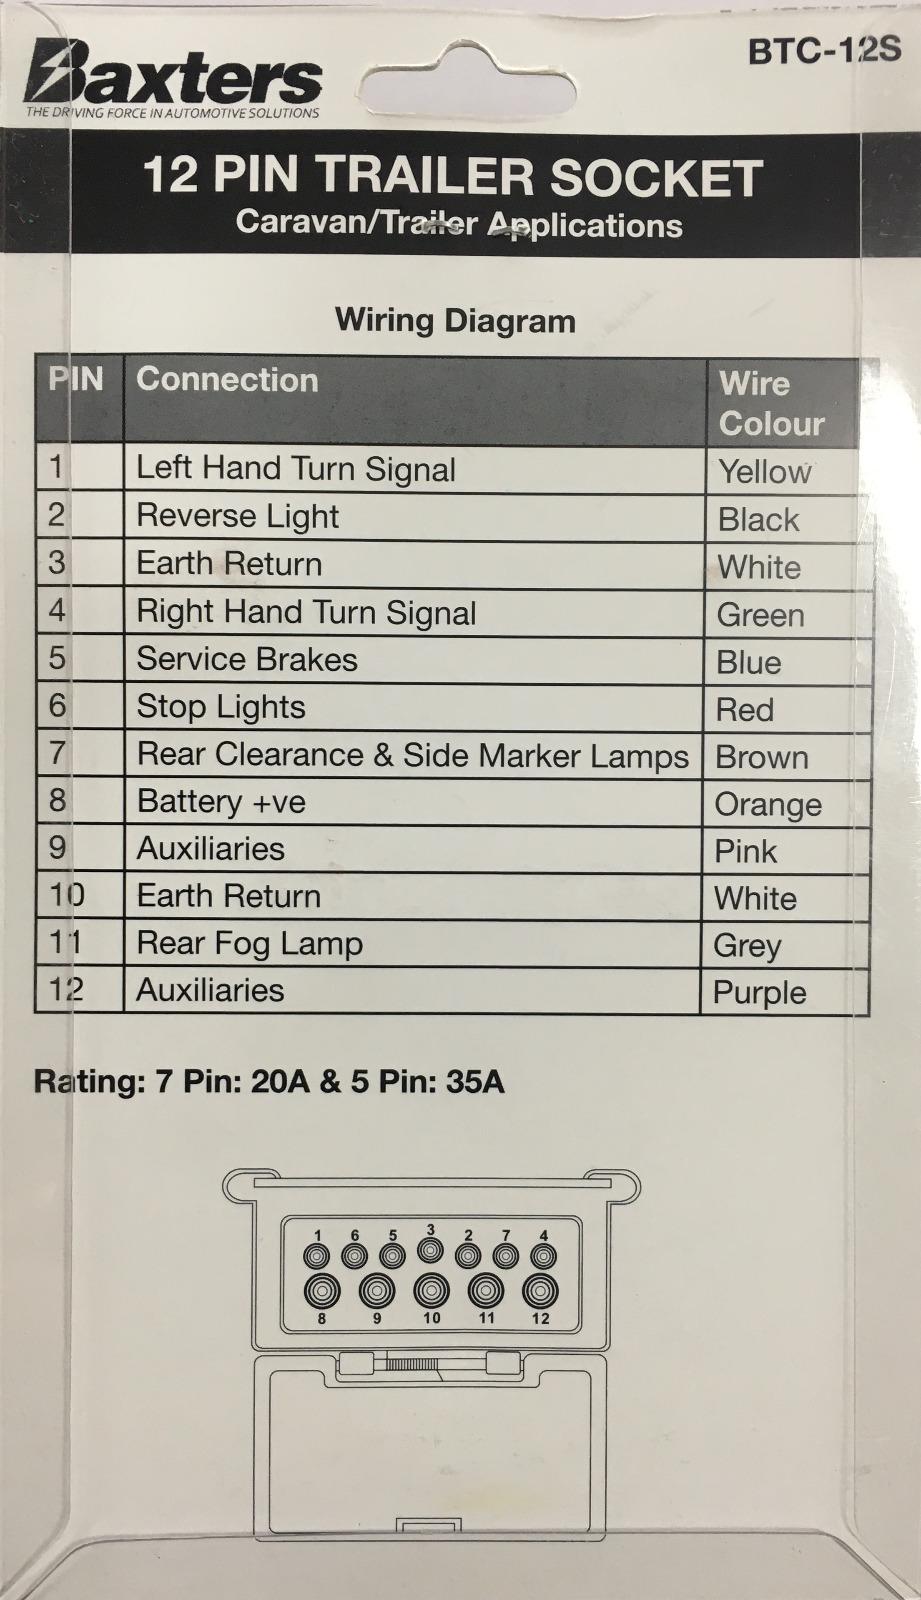 hight resolution of britax 12 pin trailer plug wiring diagram britax btc 12p 6 btc 12s